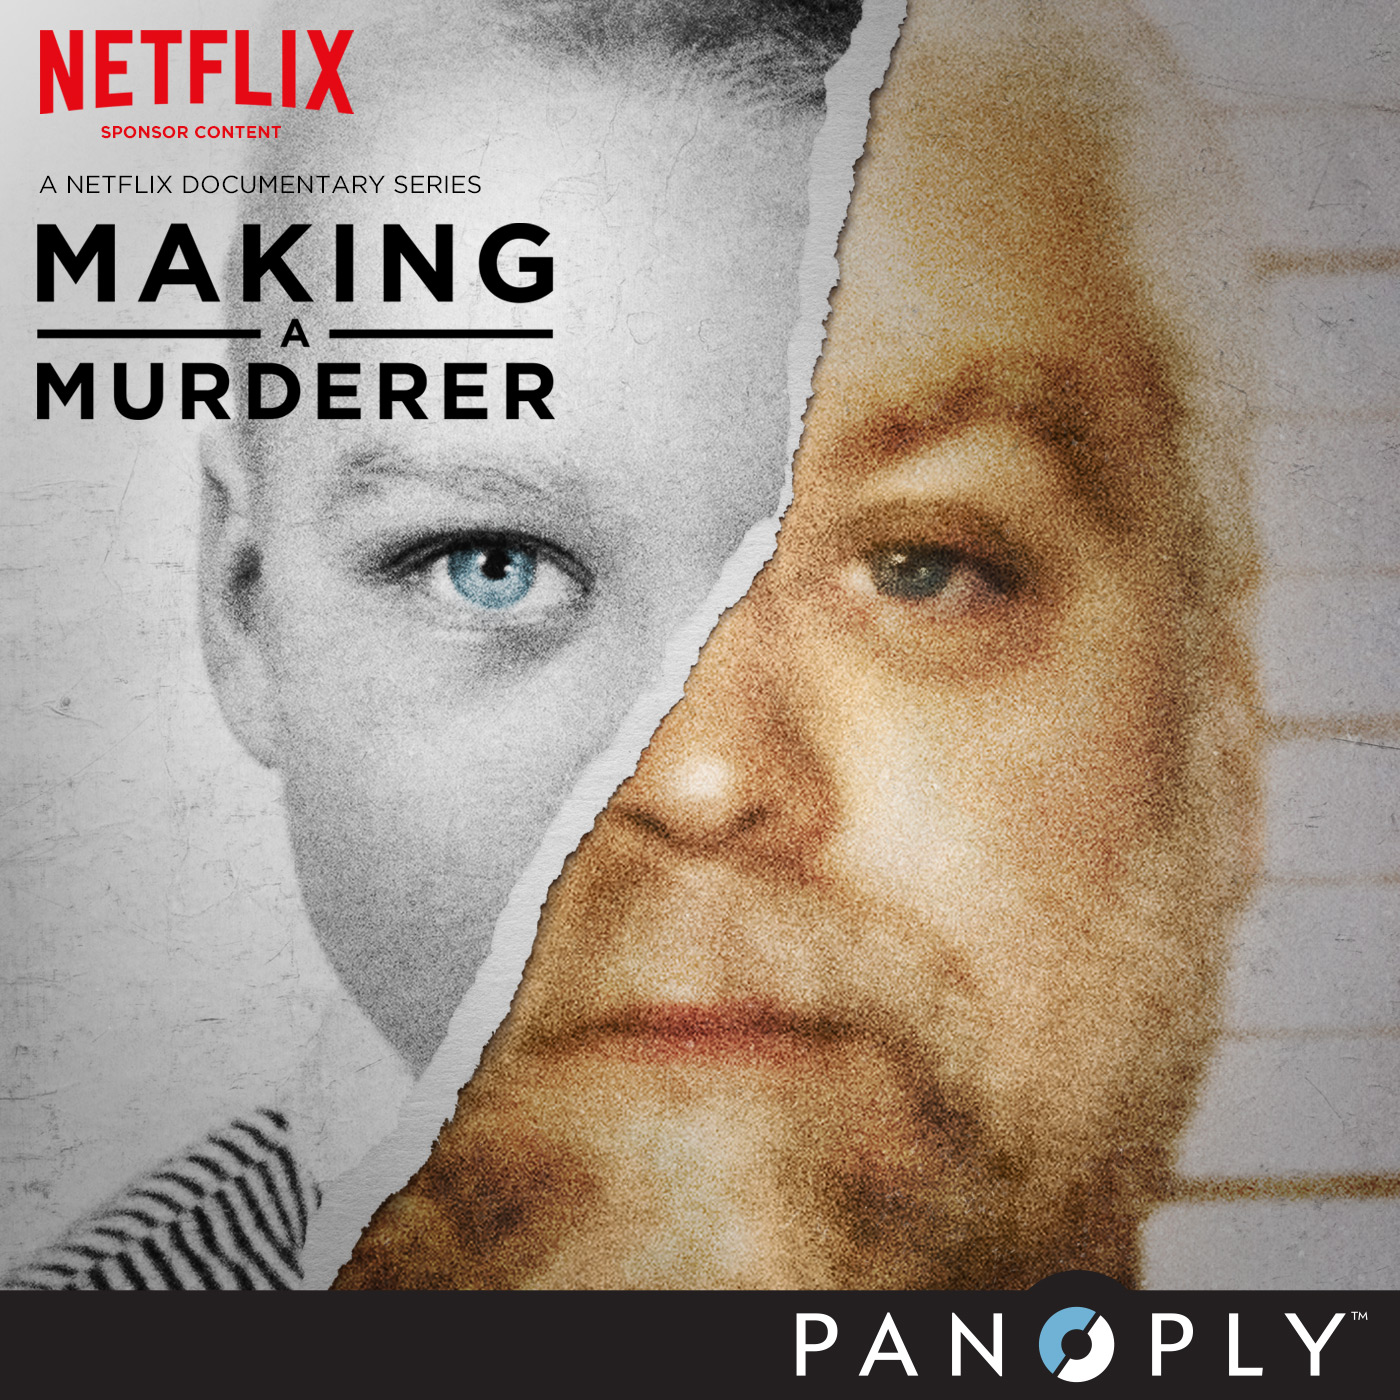 making a murderer imdb